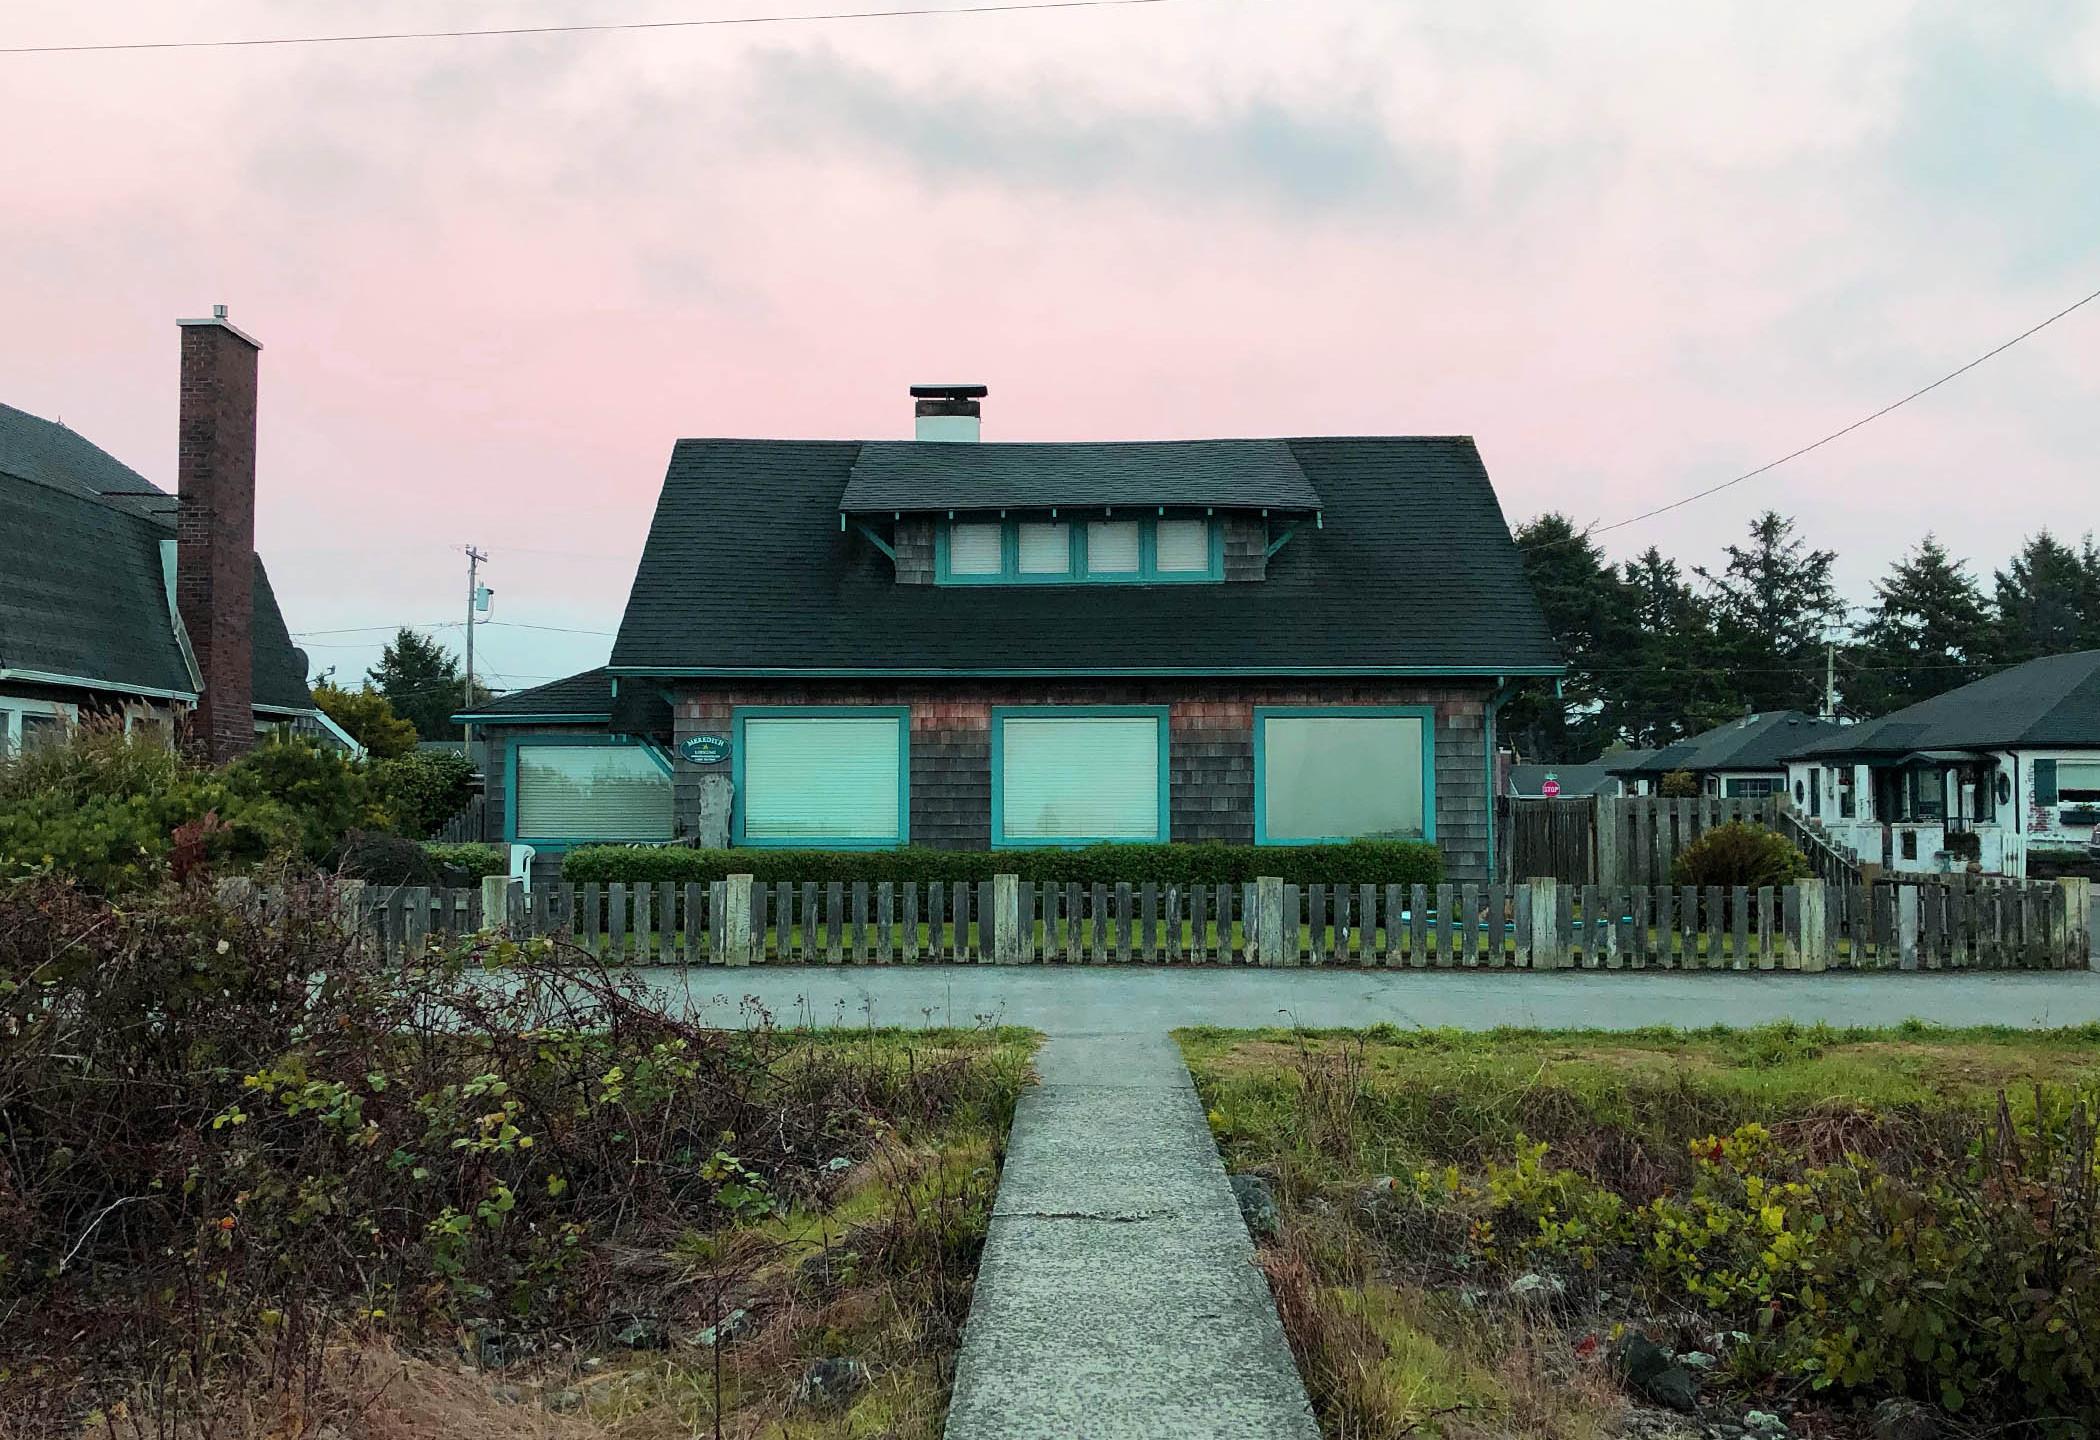 House at Sunrise